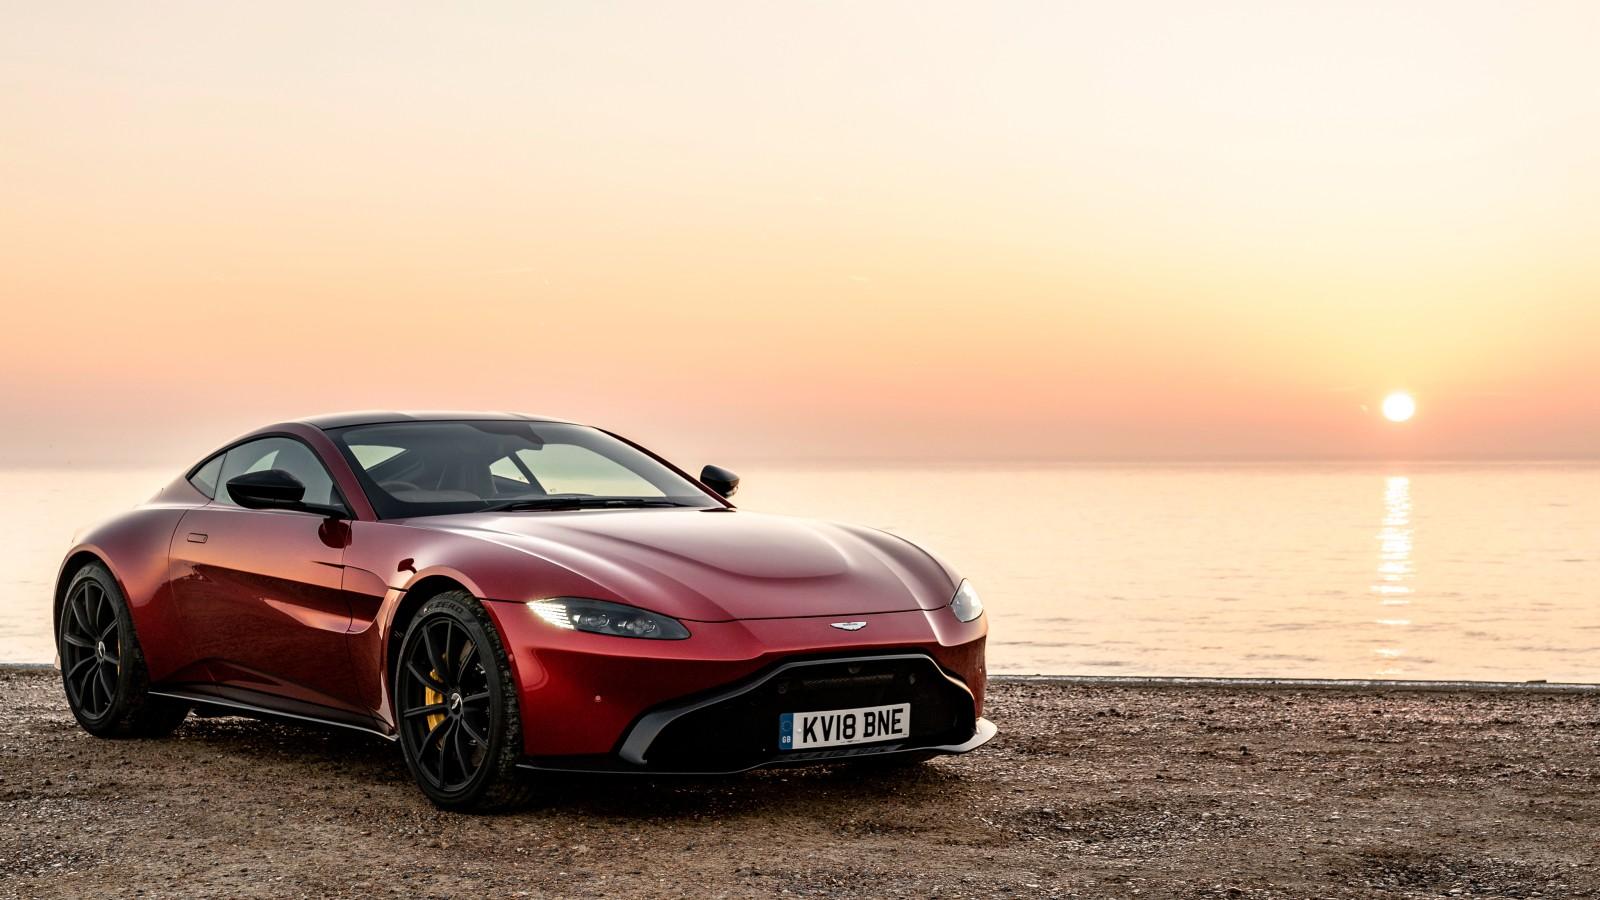 Bmw Wallpaper Iphone X Aston Martin Vantage 2019 4k Wallpaper Hd Car Wallpapers